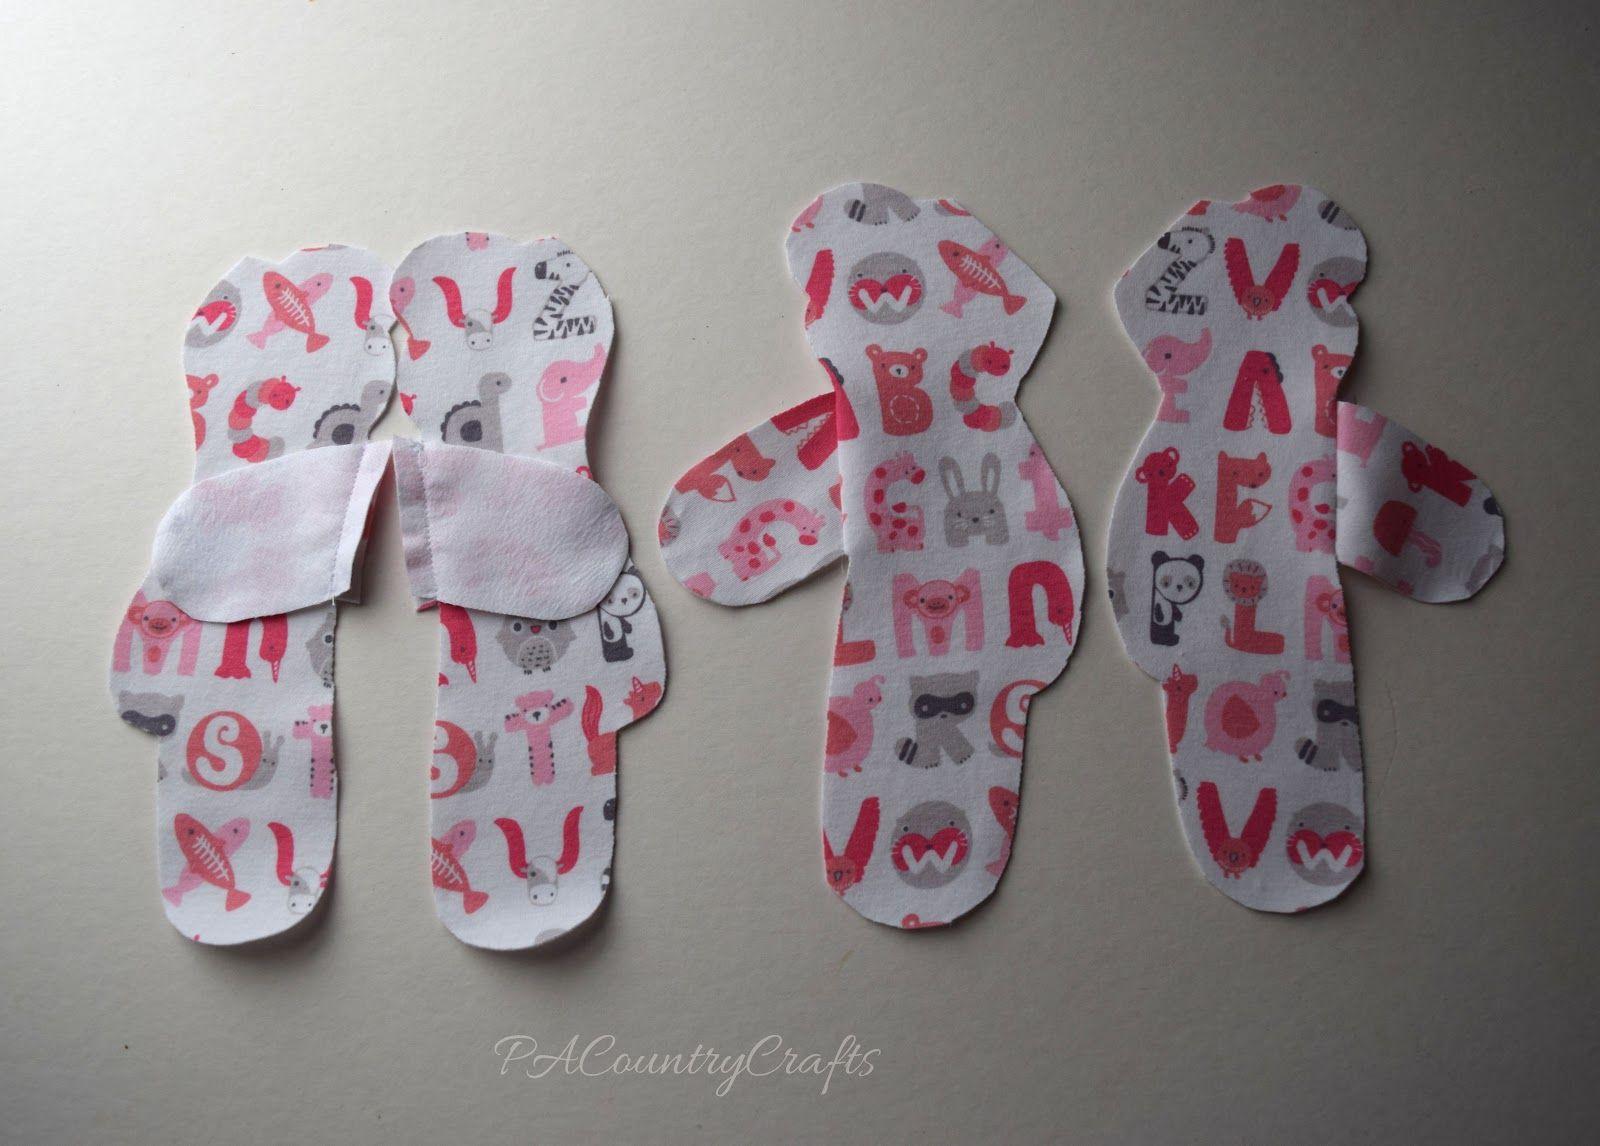 Memory bear sewing pattern pieces s e w i n g p r o j e c t s memory bear sewing pattern pieces jeuxipadfo Choice Image